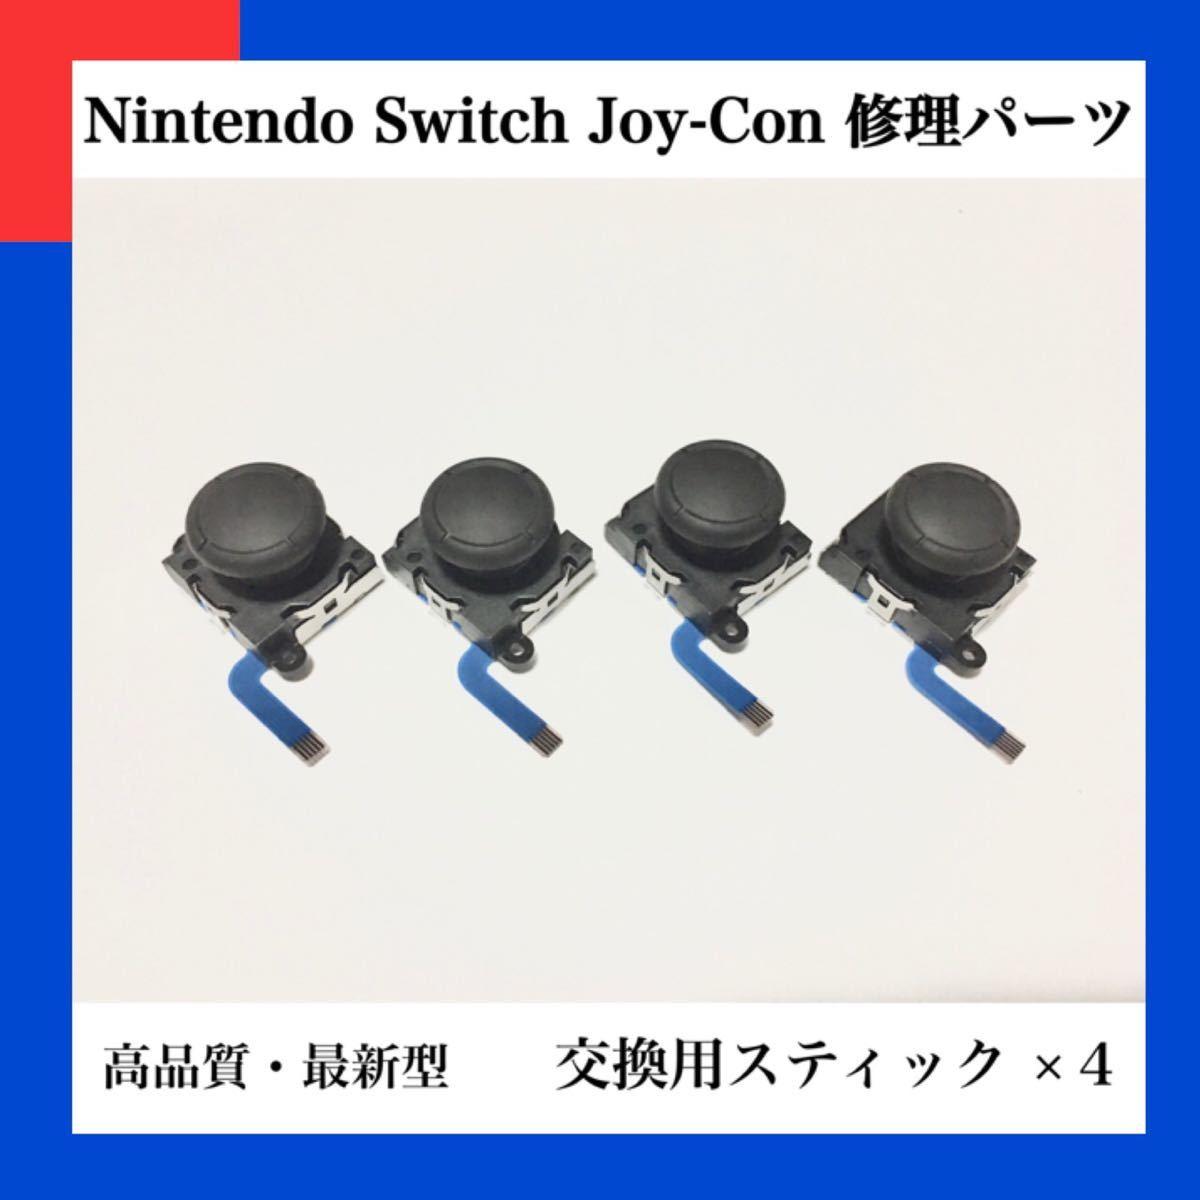 Nintendo Switch Joy-Con 修理パーツ 4個入り